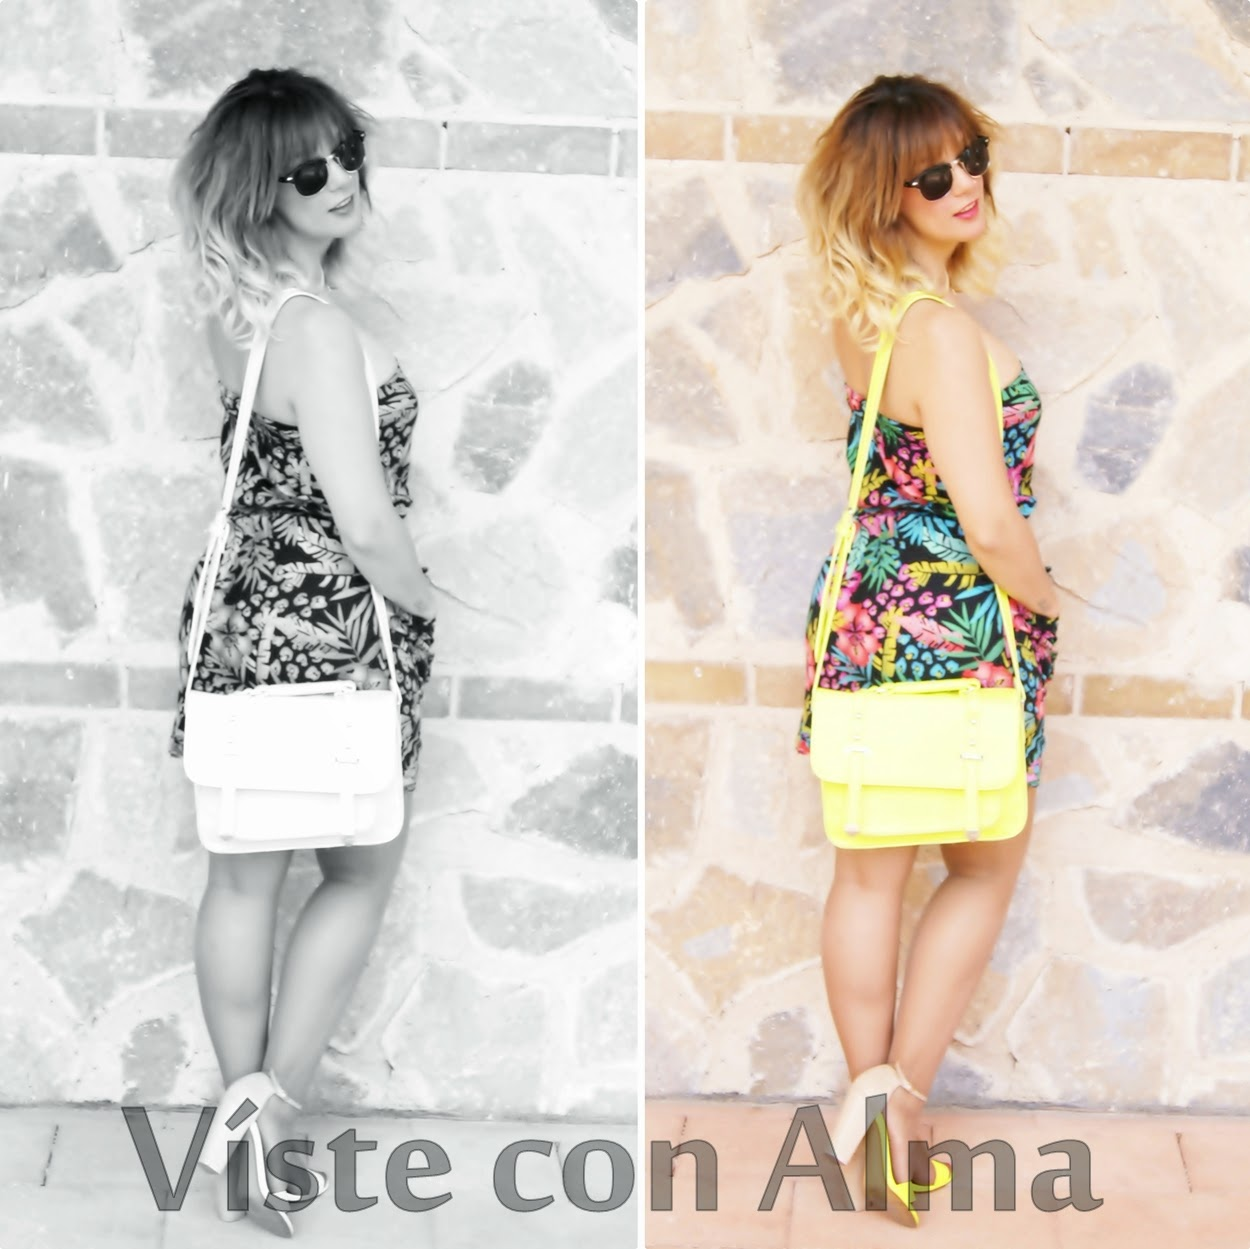 Viste con Alma